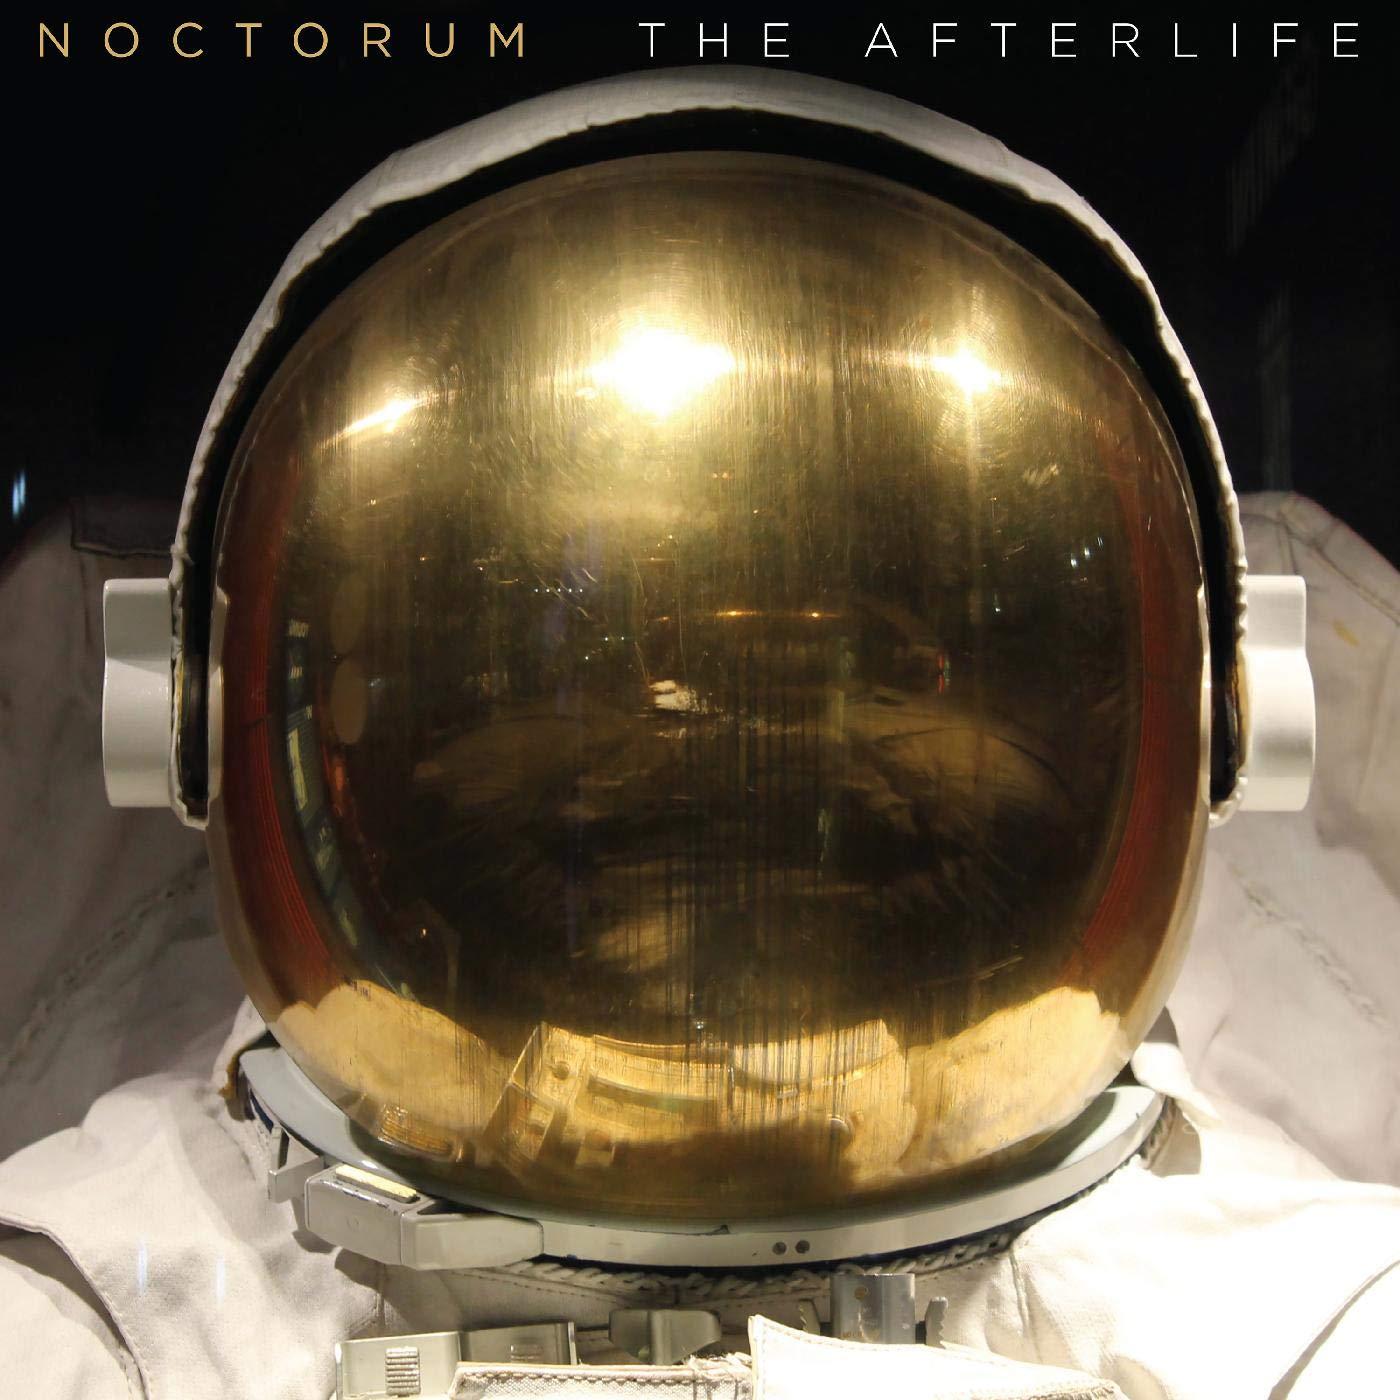 Noctorum - The Afterlife